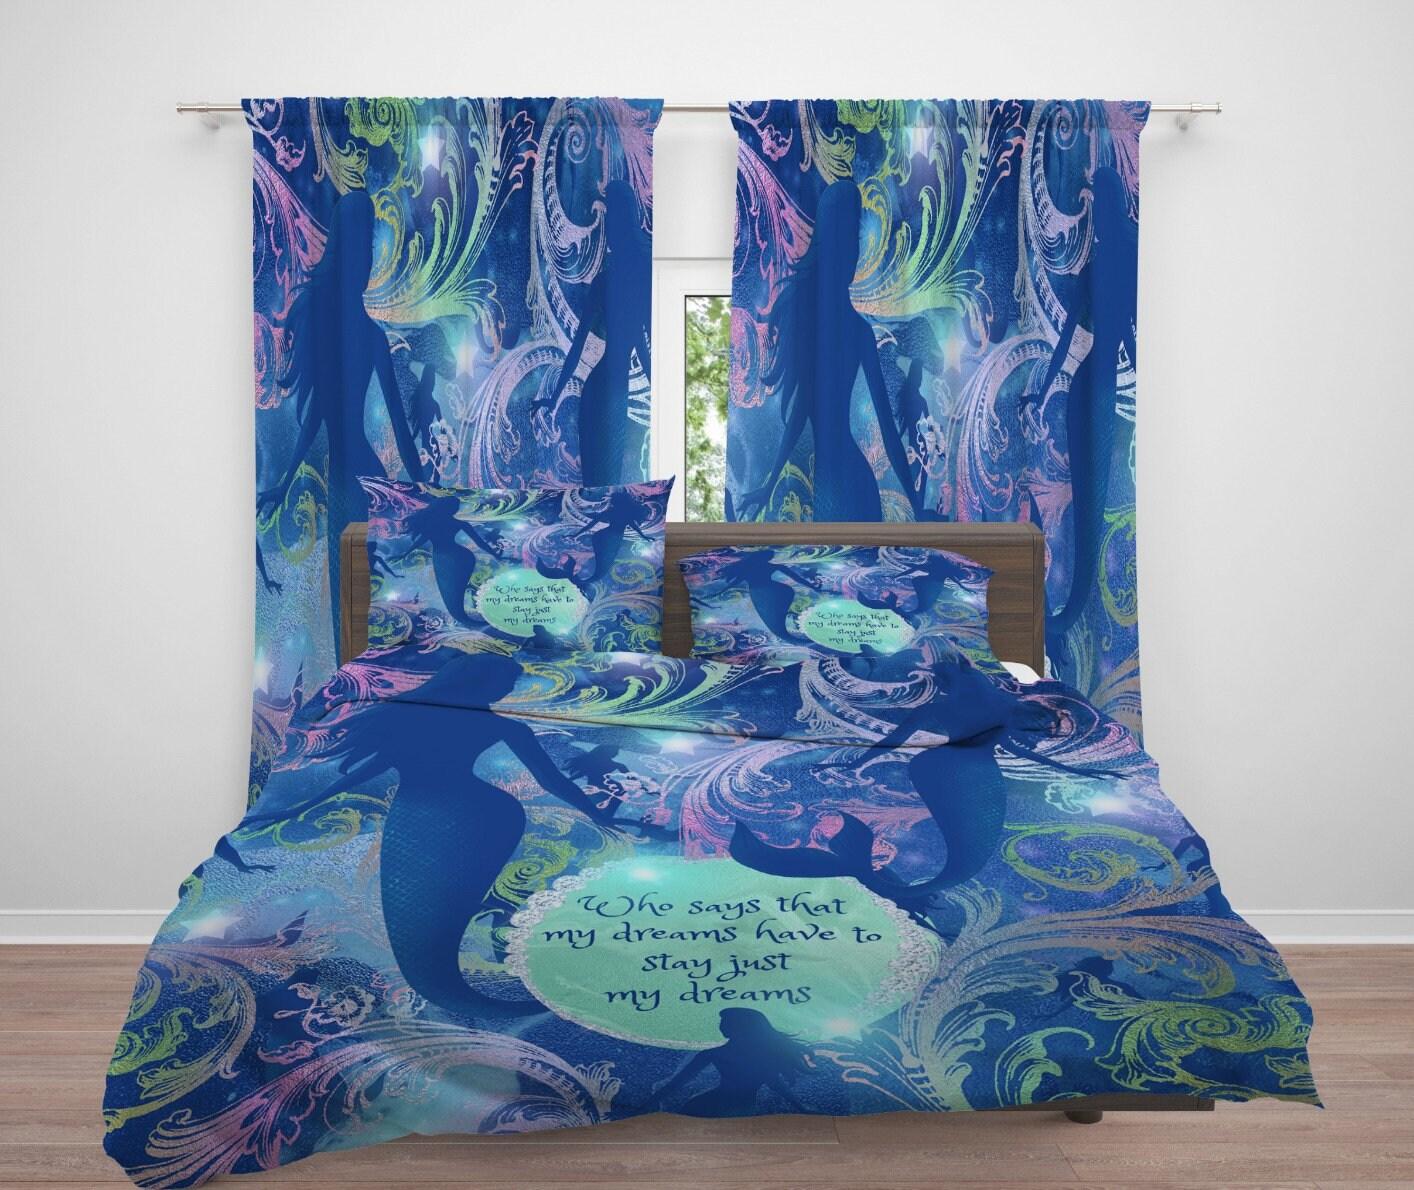 Mermaid Comforter Duvet Cover Dreams Bedding